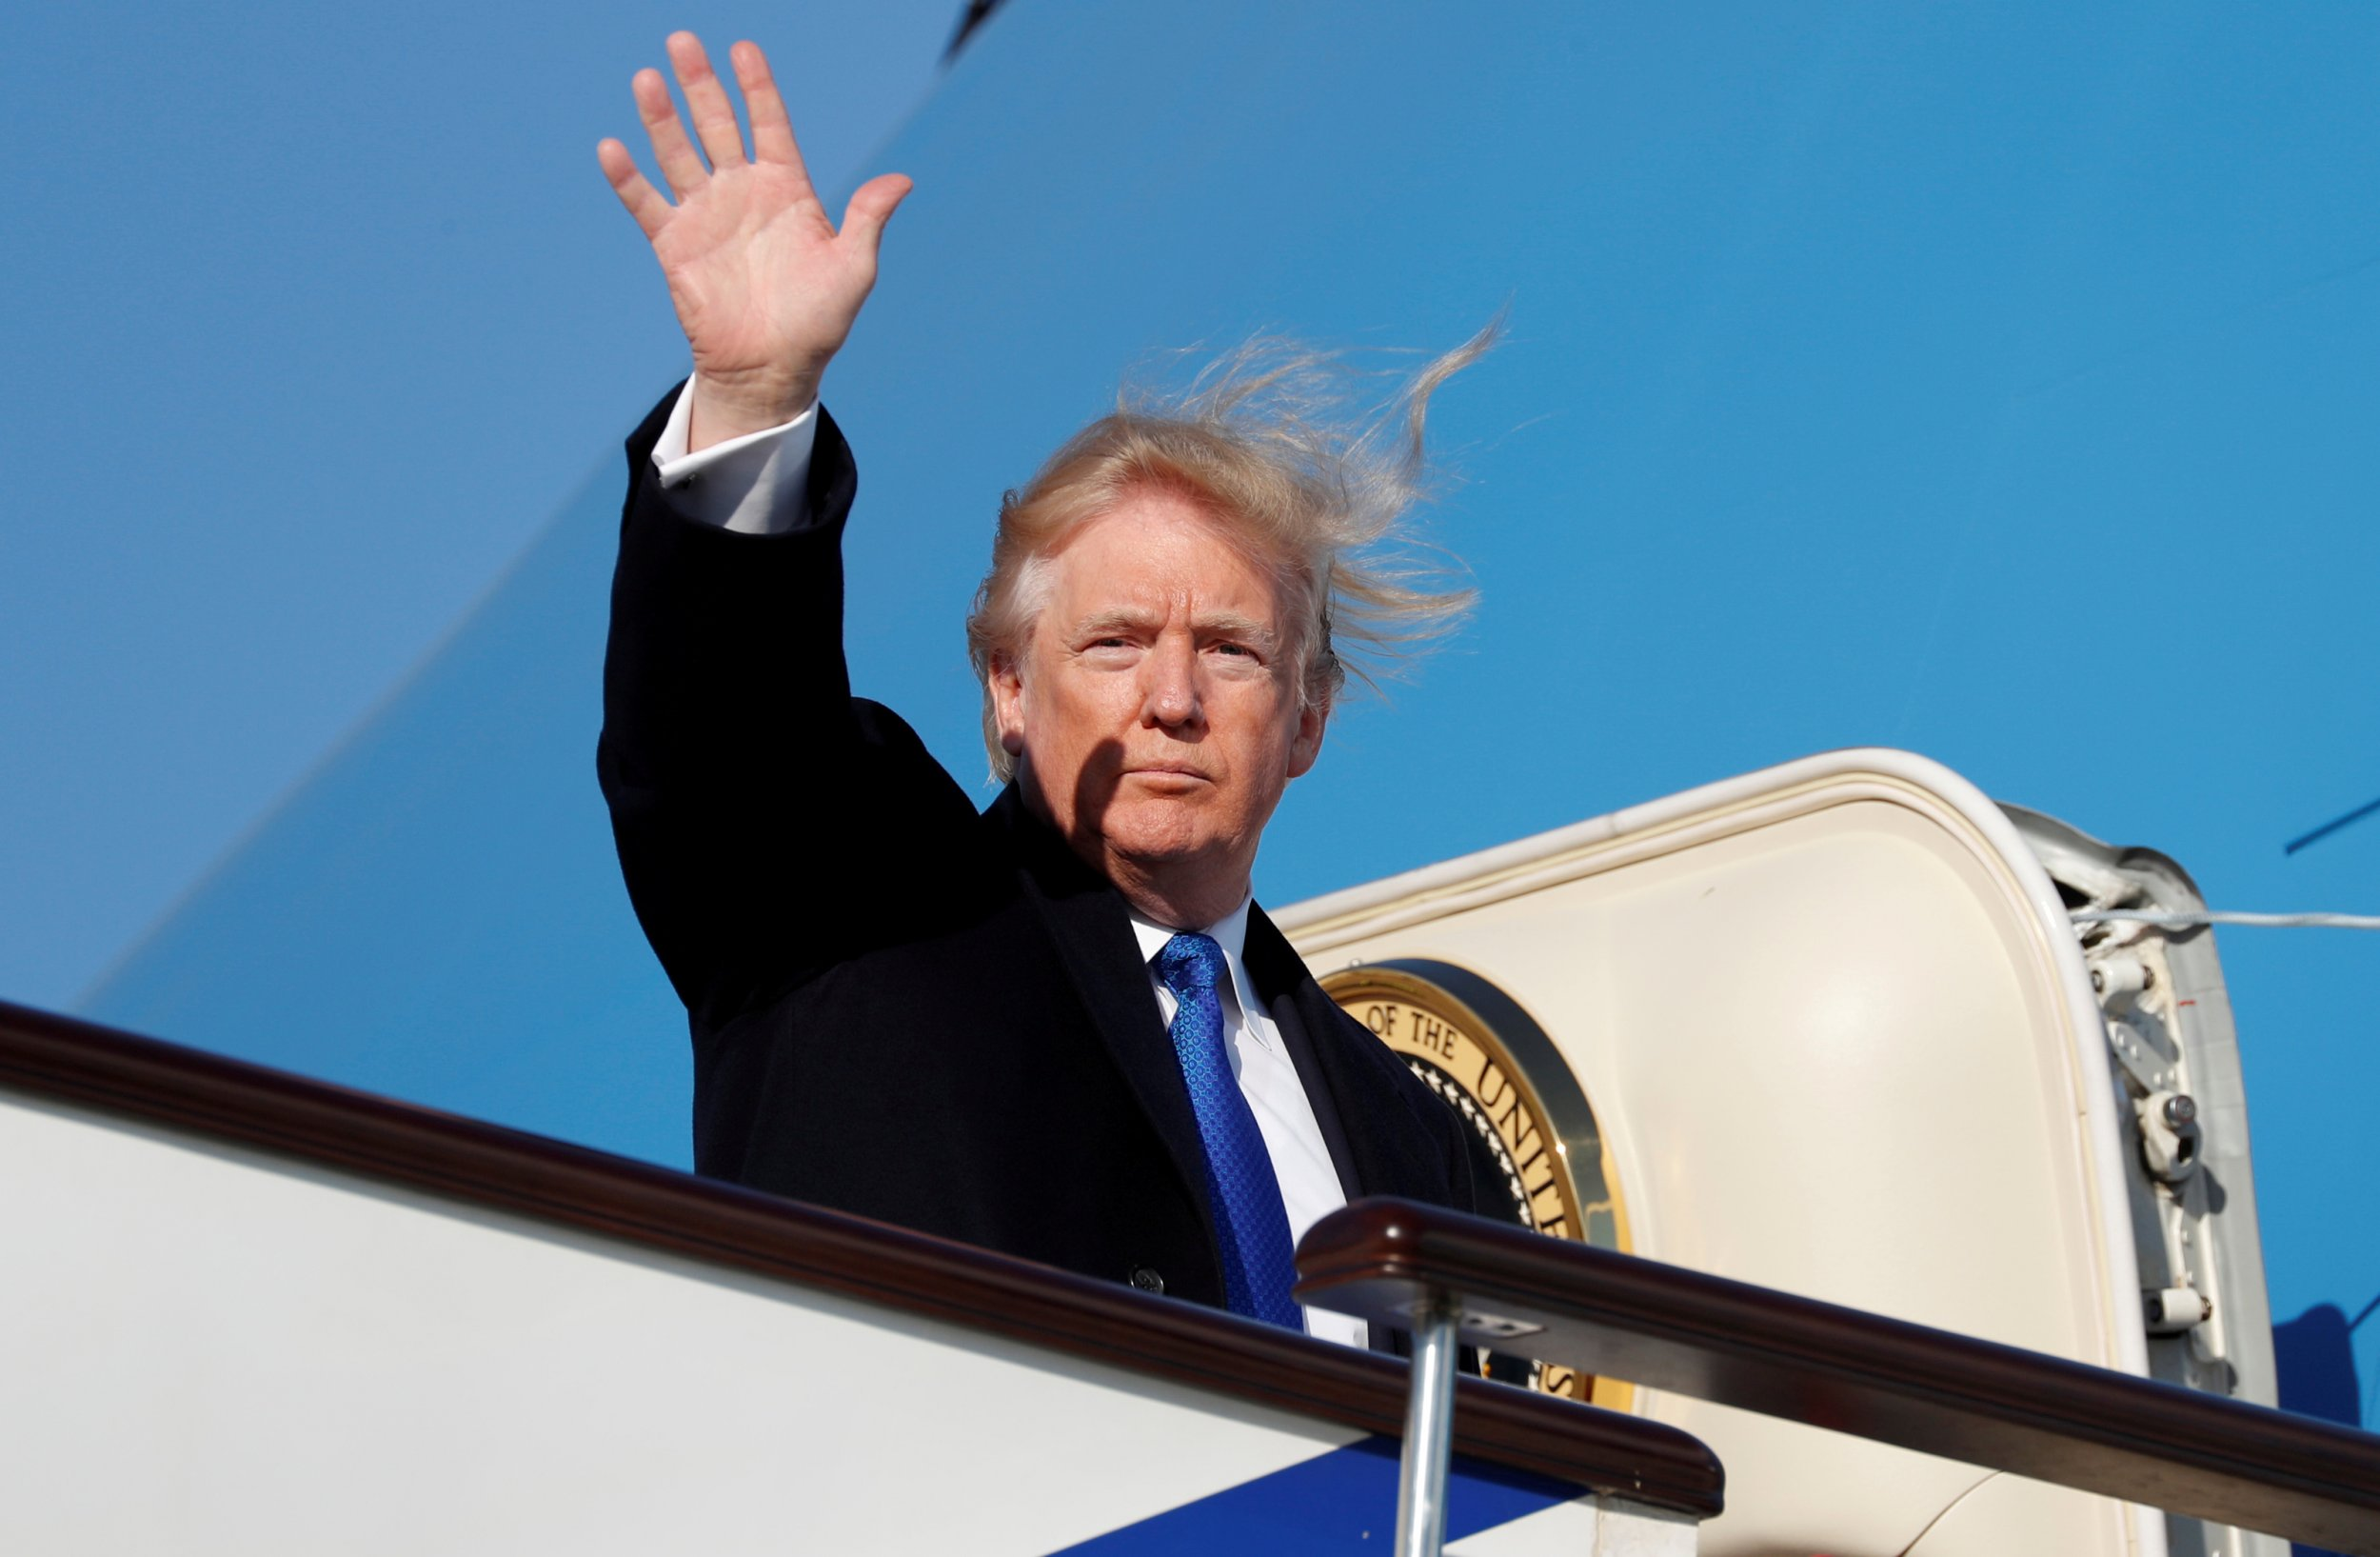 12_18_DonaldTrump